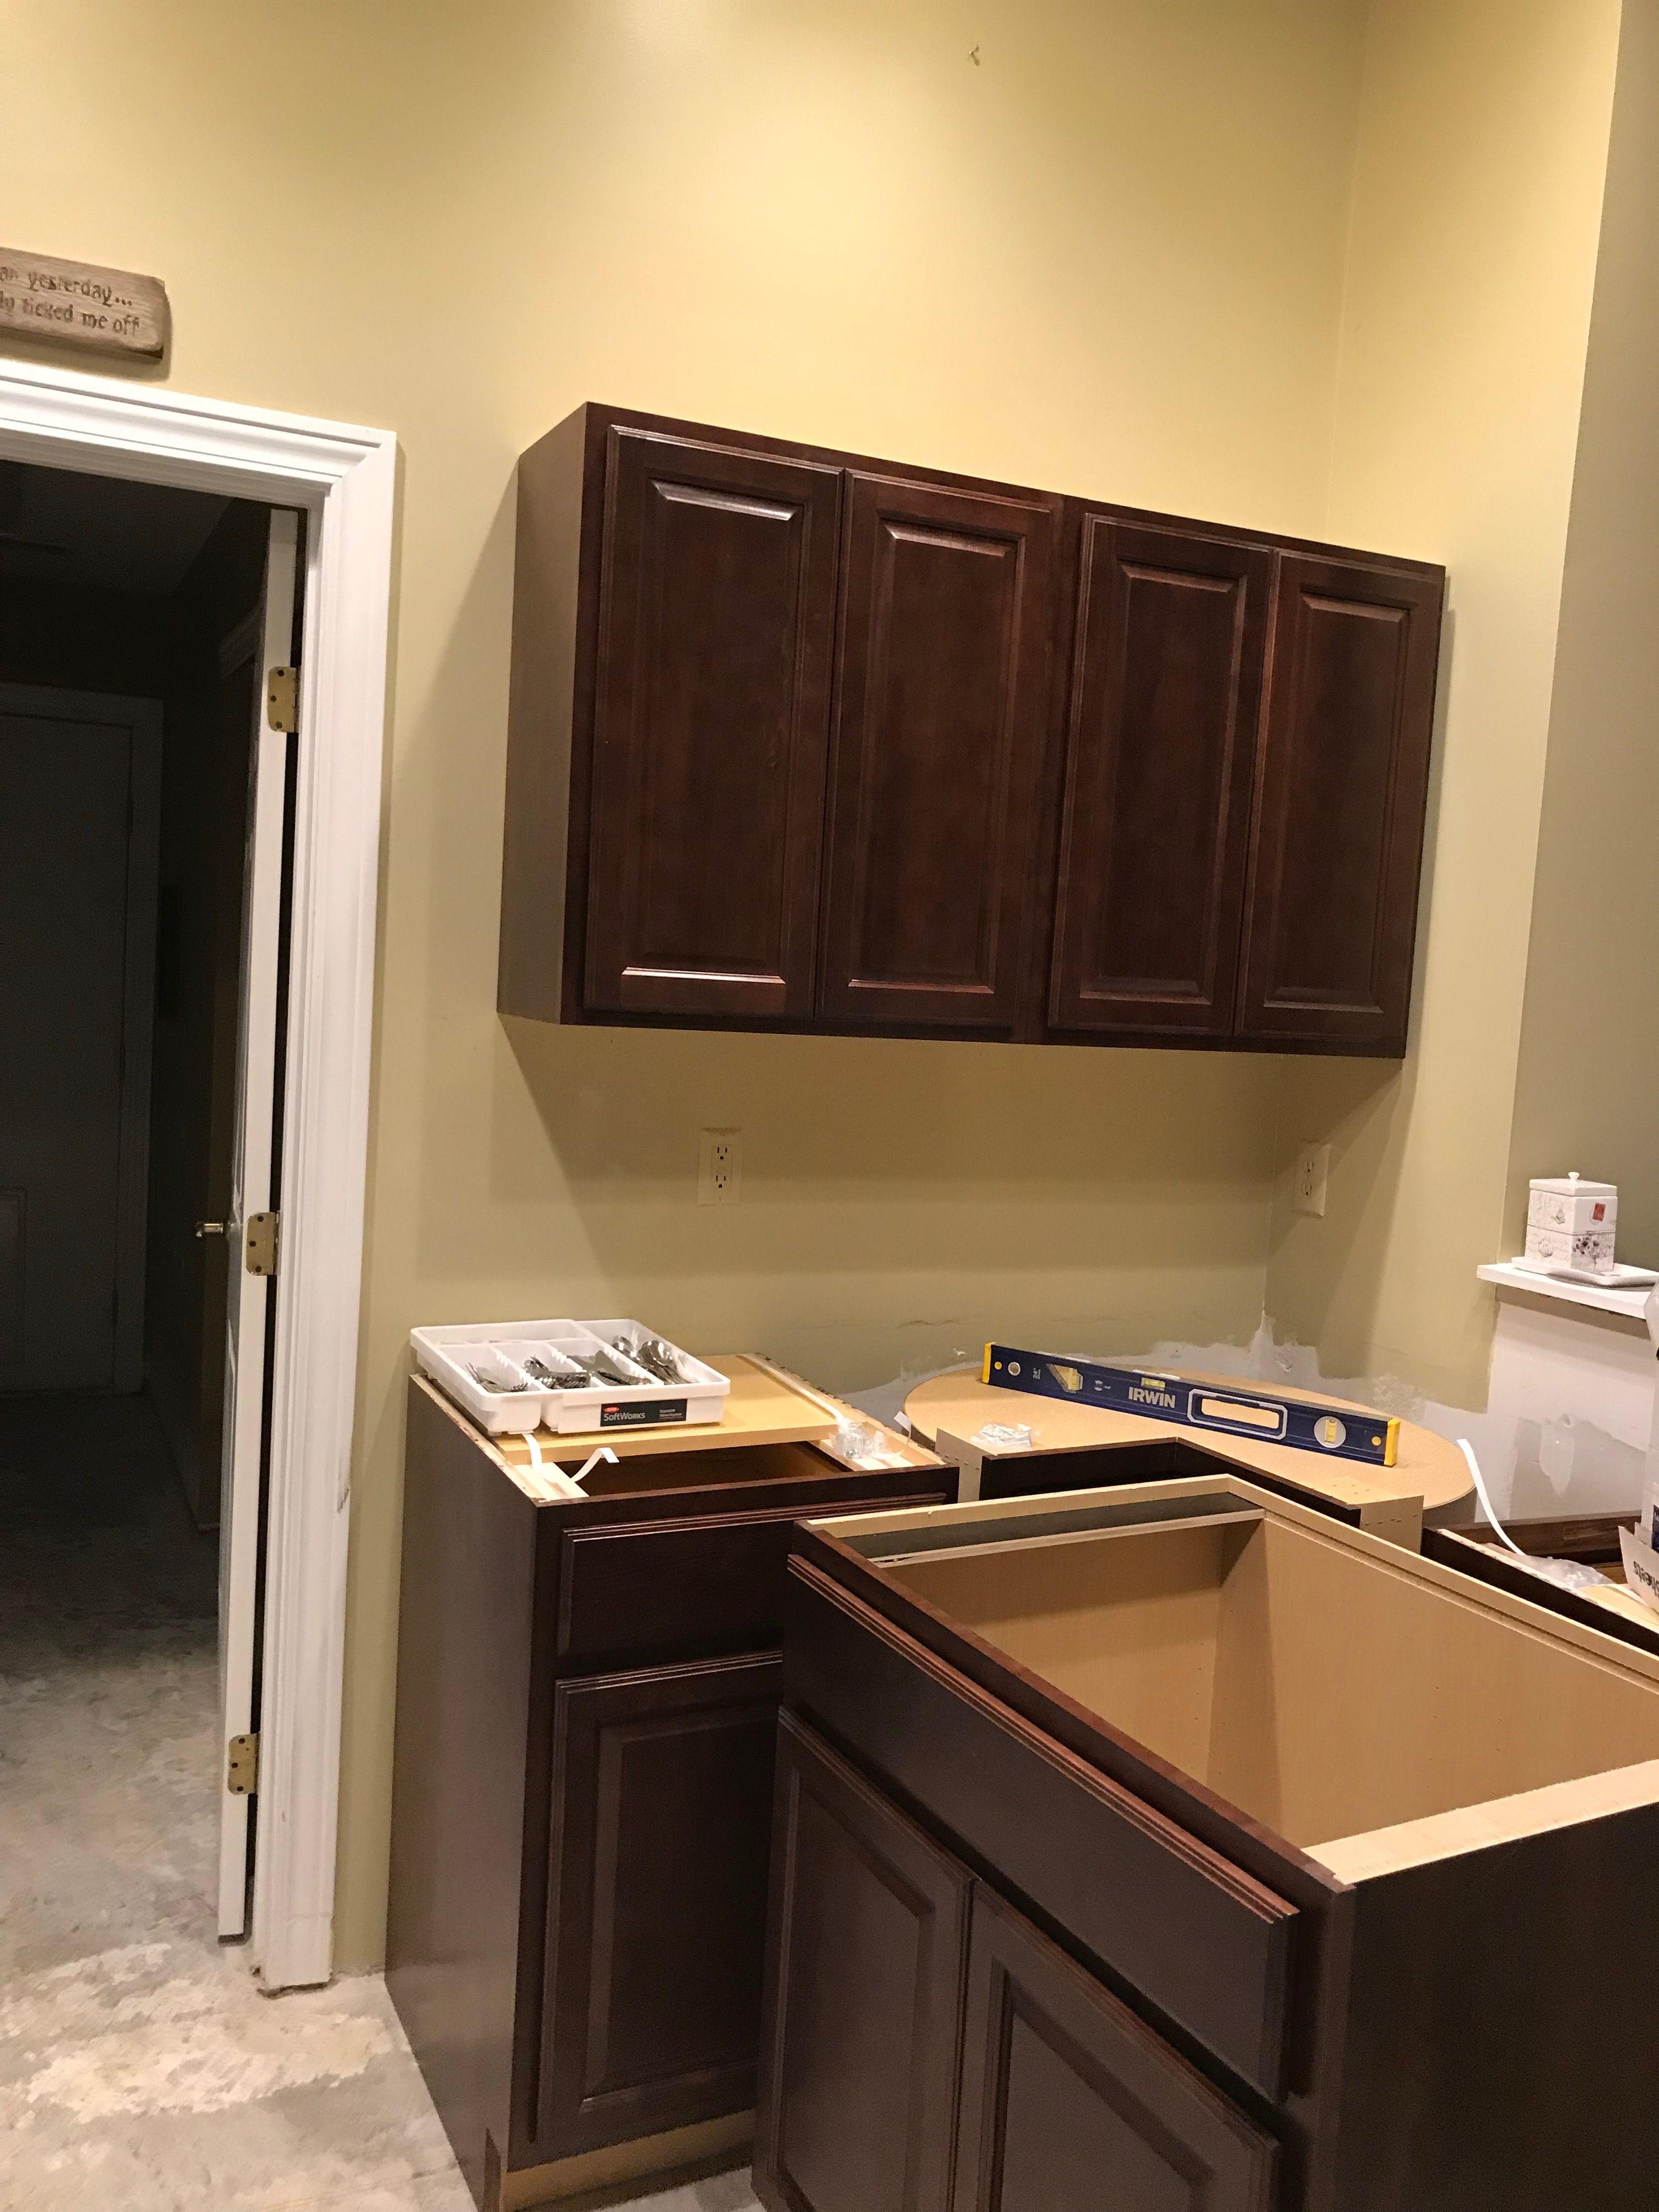 Pin by Cheryl Zalis on My kitchen renovation   Pinterest